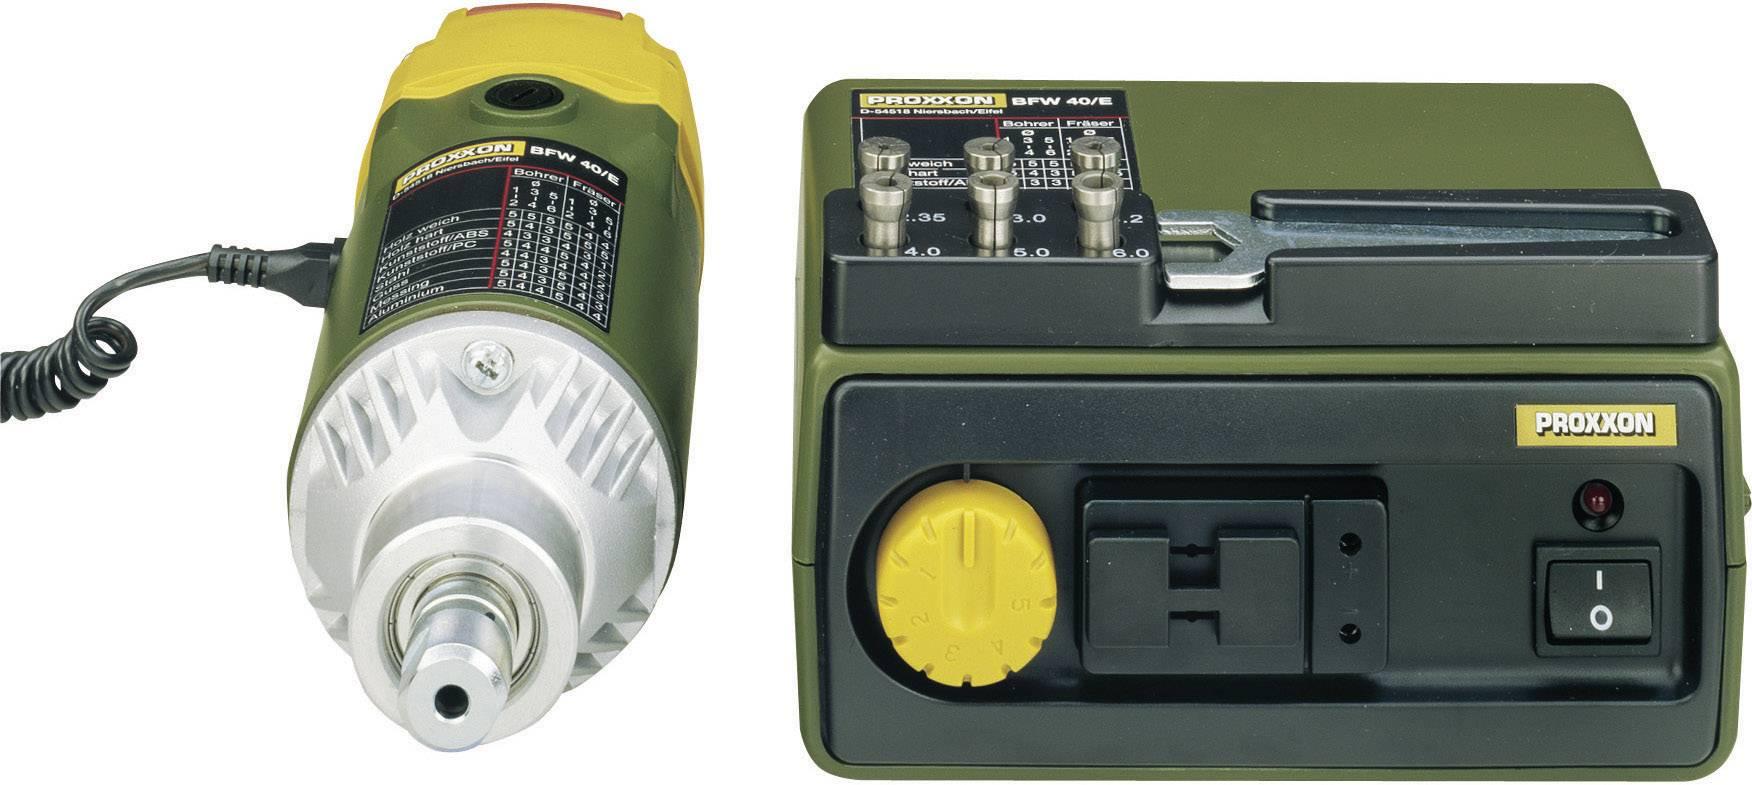 Frézovací motor Proxxon Micromot BFW 40/E